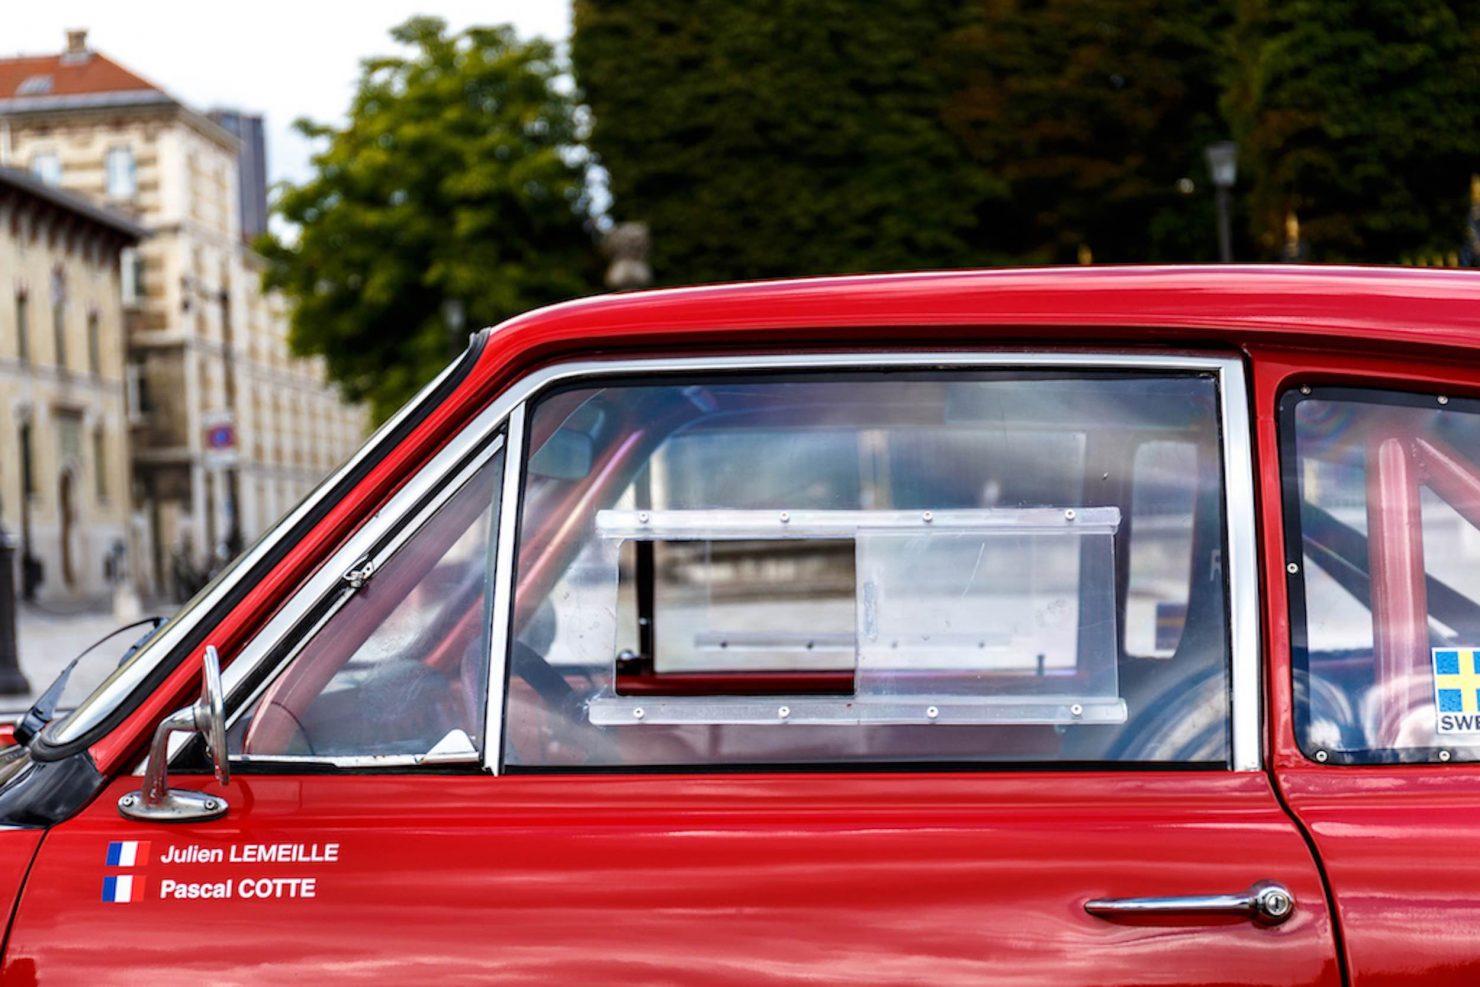 opel kadett rallye car 8 1480x987 - 1969 Opel Rallye Kadett